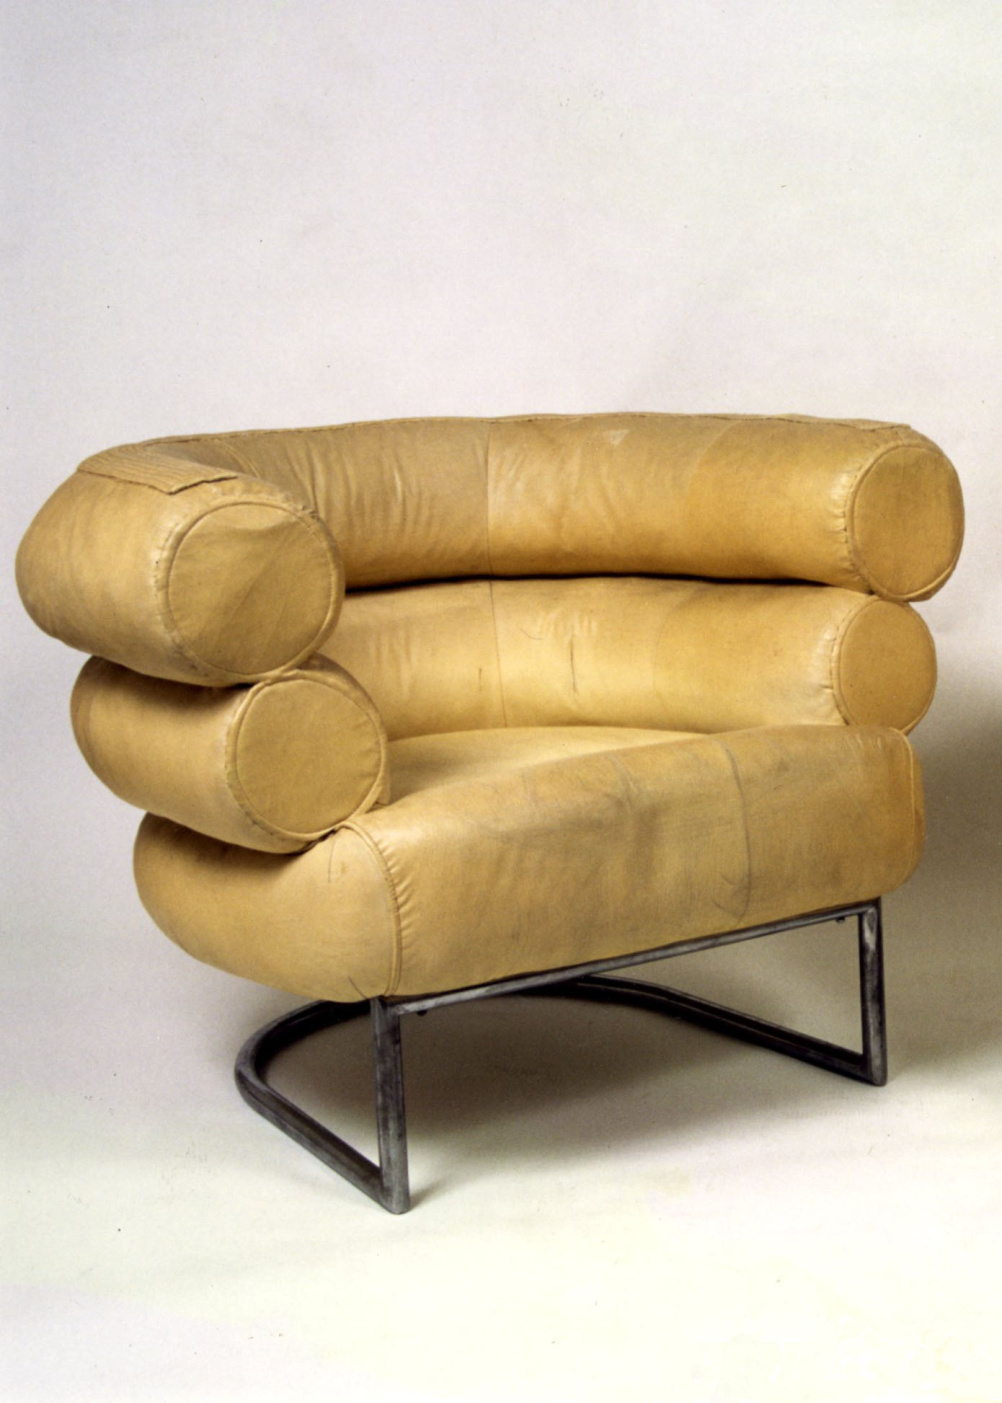 Eileen Gray, Bibendum armchair, circa 1930, Chrome-plated metal, cancas, Photography:Christian Baraja, studio SLB and Provenance: Private collection, Paris